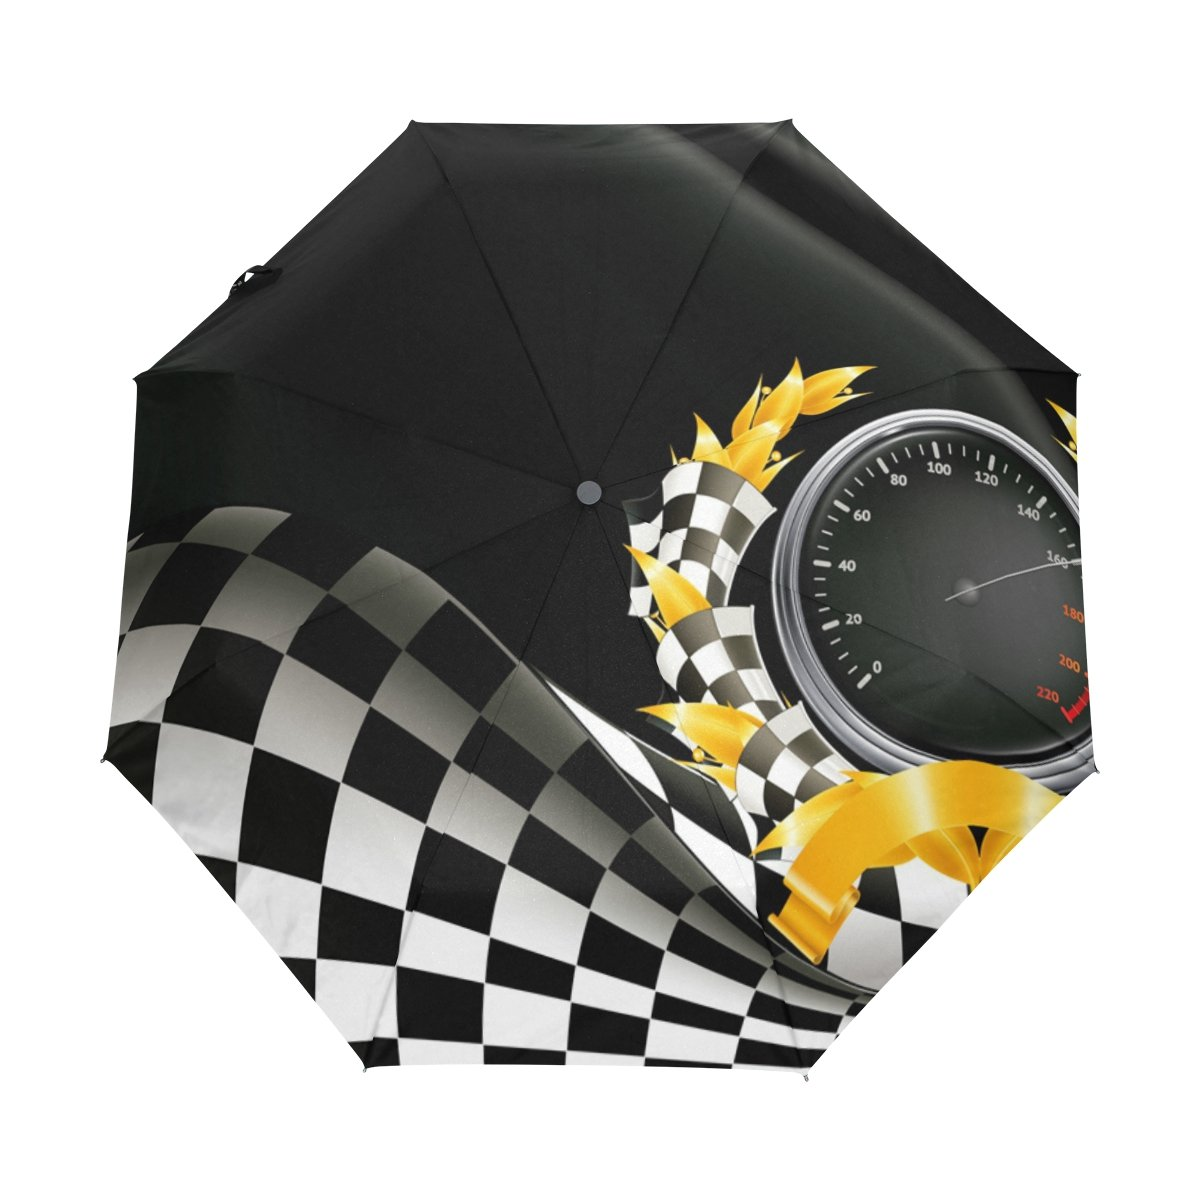 deyya Racing背景カスタム折りたたみ式太陽雨傘Wind Resistant防風折りたたみトラベル傘 B0757N7C2D